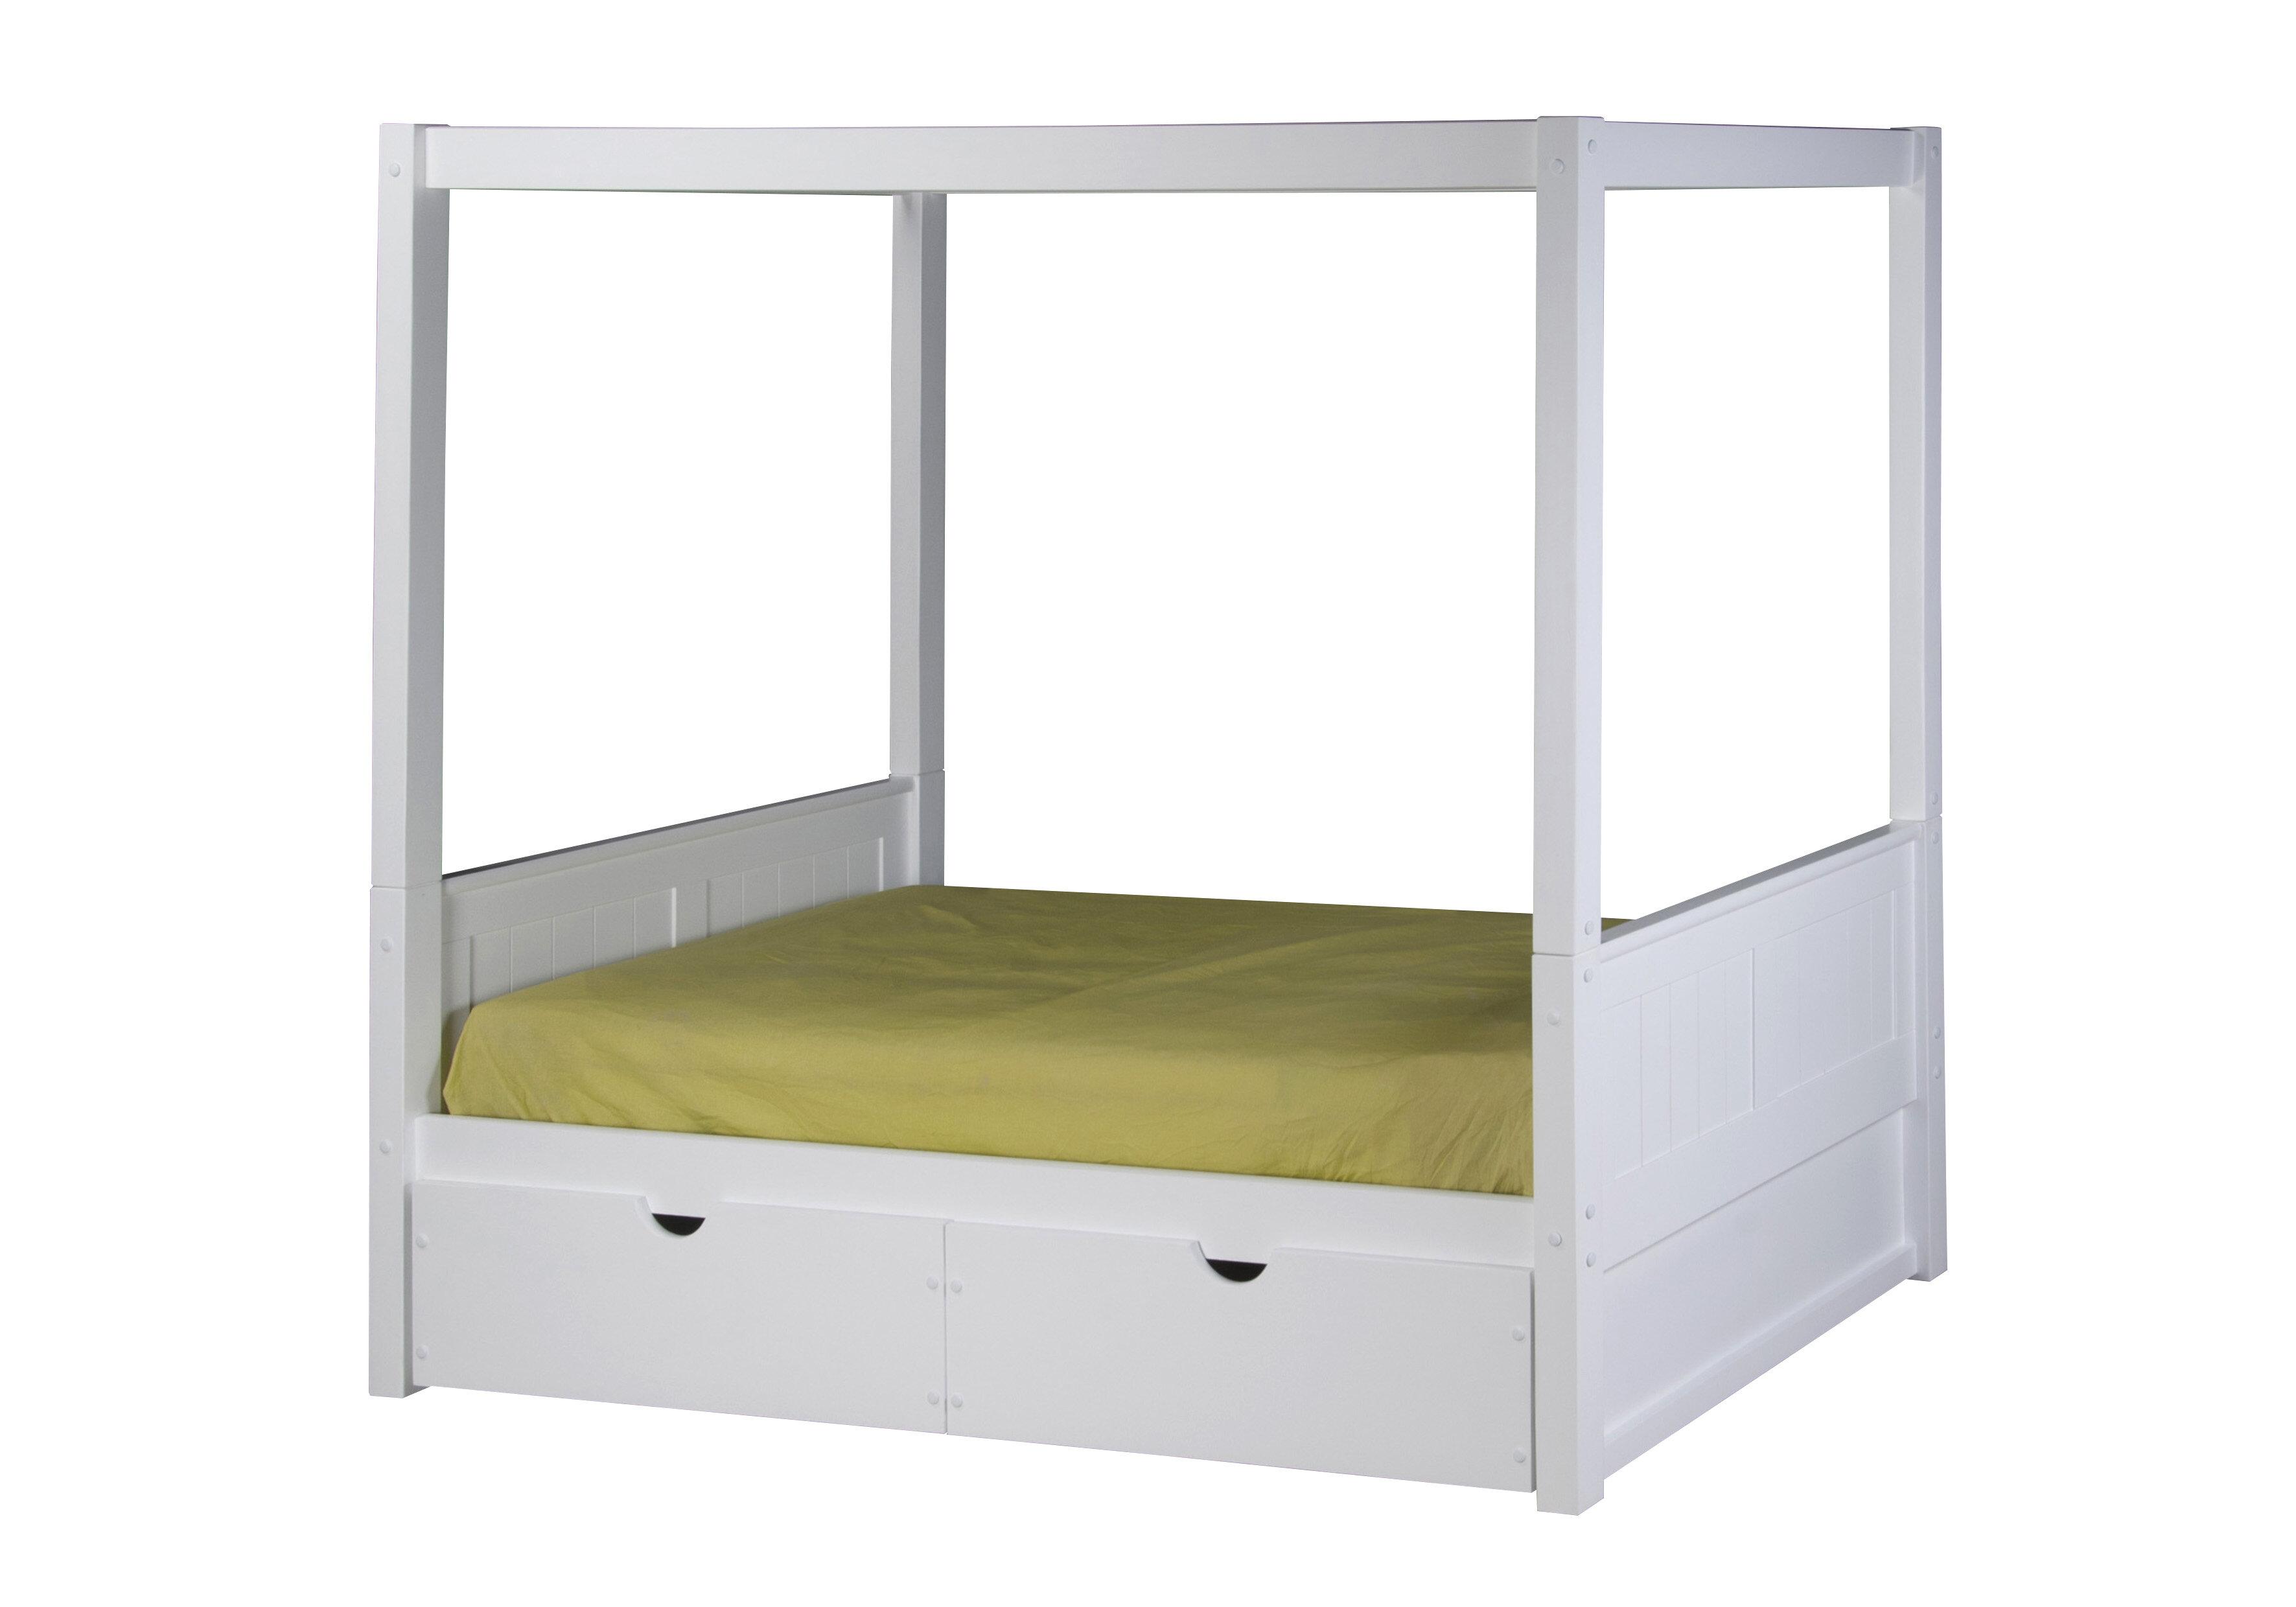 Harriet Bee Oakwood Twin Canopy Bed & Reviews | Wayfair